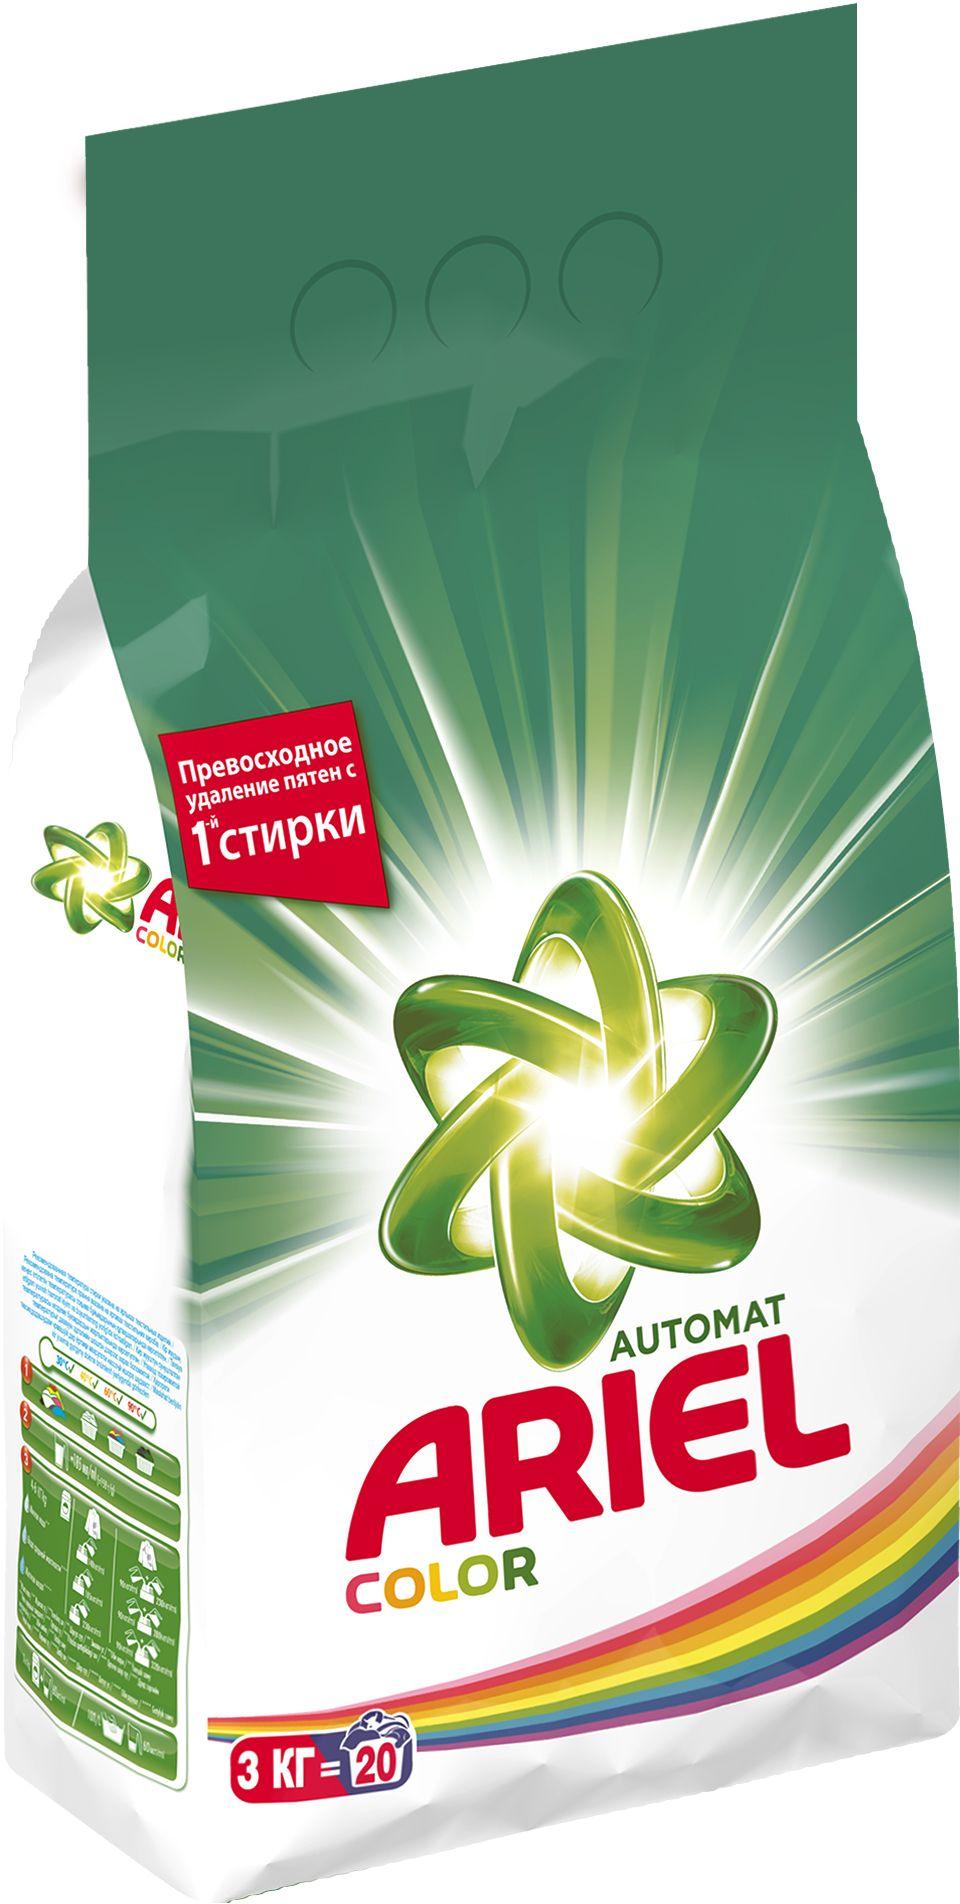 ariel ARIEL Color & Style 3 кг Автомат (5413149333437)